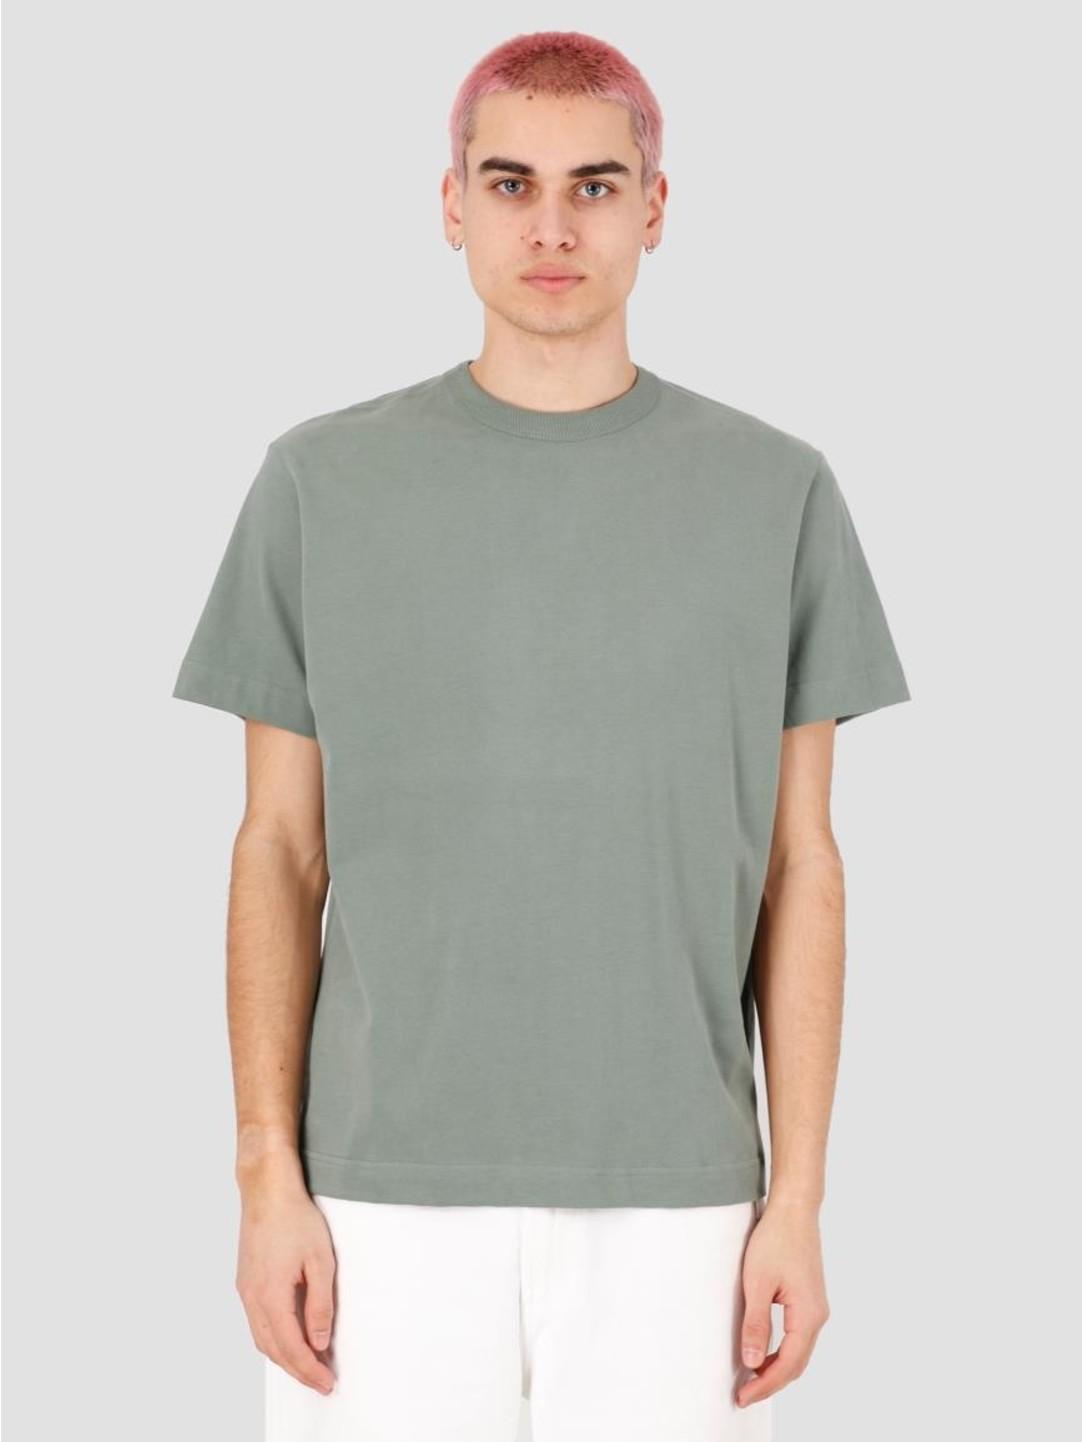 EU FC EU FC Casimiro T-shirt Olive Green